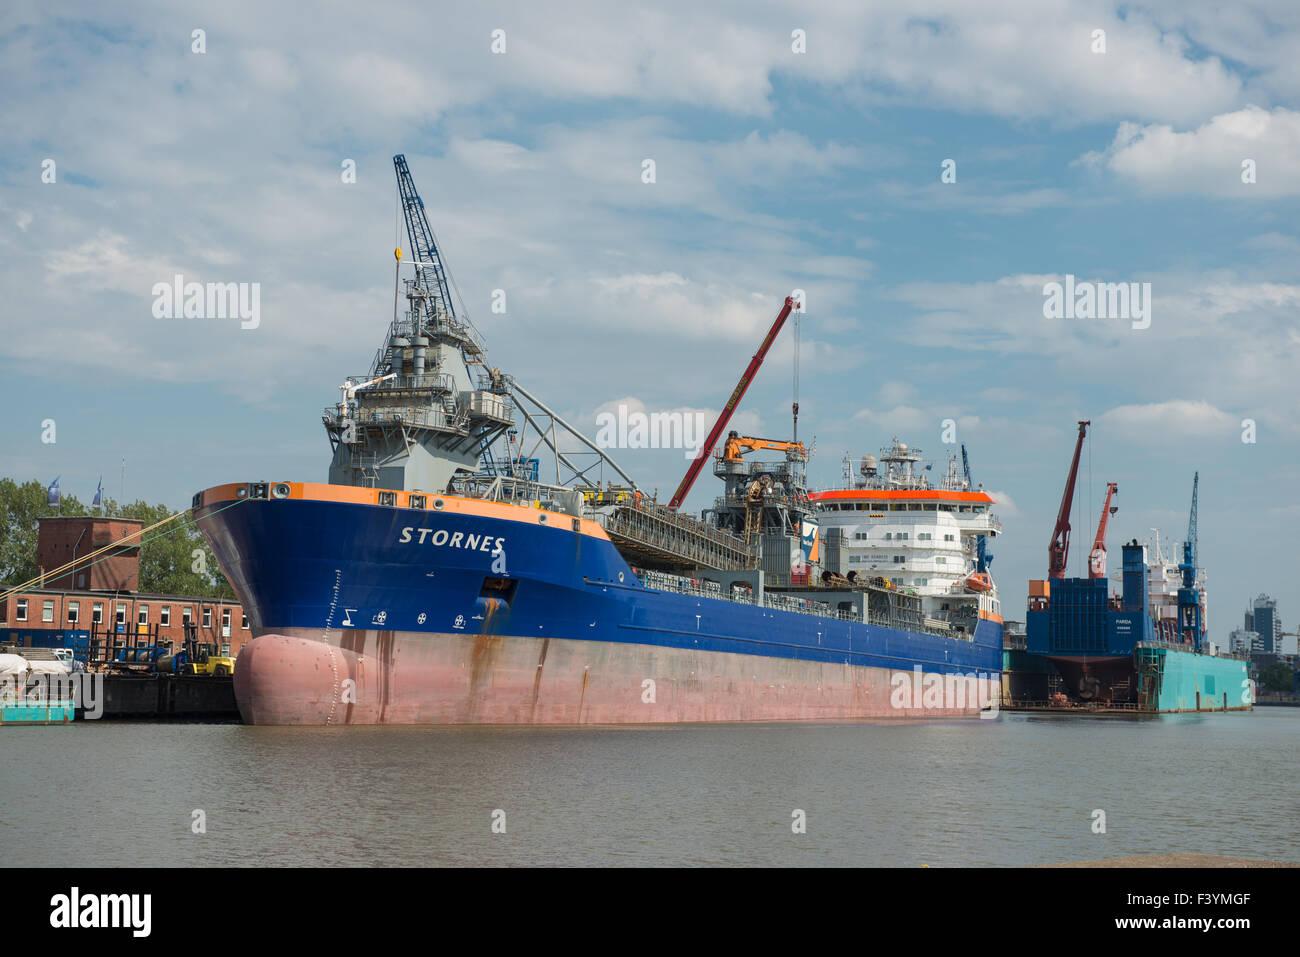 Fallpipe vessel Stornes - Stock Image